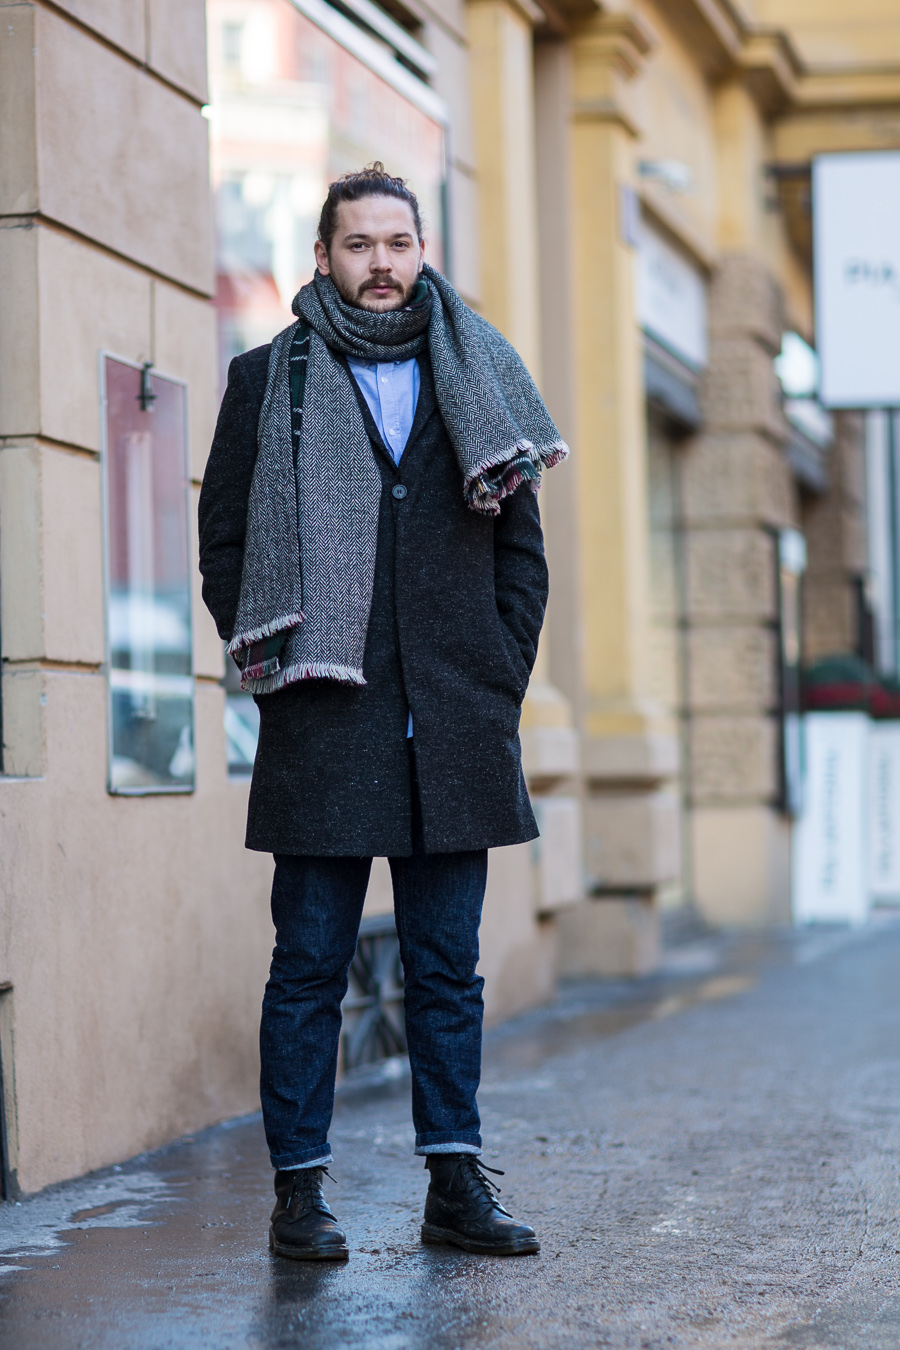 street-style-fashion-blog-innsbruck-patrick